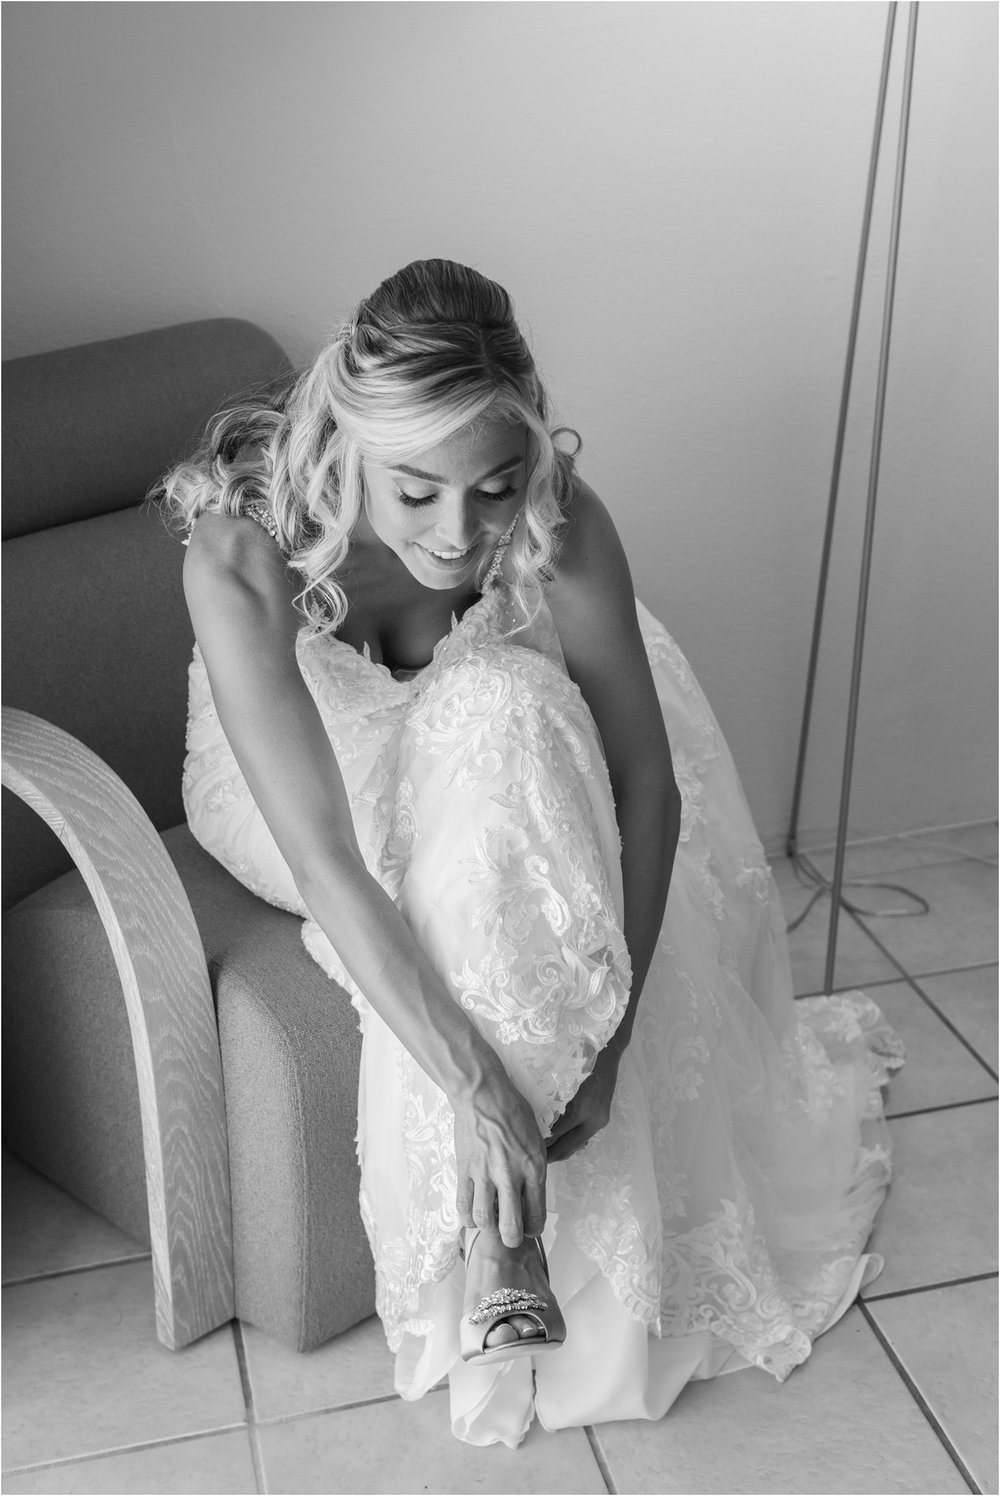 ©FianderFoto_Destination_Wedding_Photographer_Bermuda_Wedding_Photographer_Jaclyn_Anthony__Grotto Bay_026.jpg